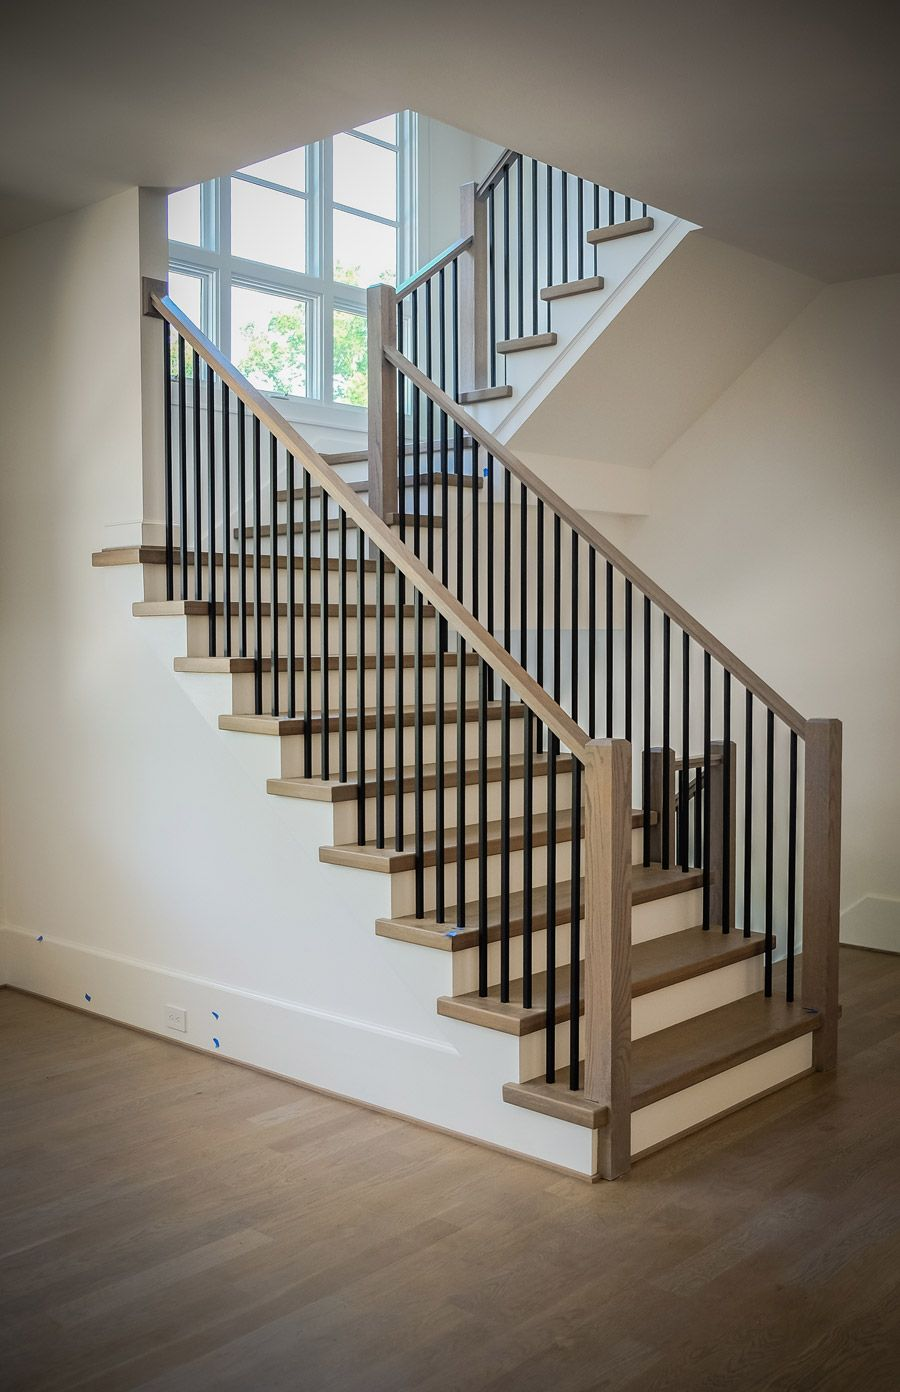 Metal Baluster System In 2020 Stair Railing Design   Indoor Railings For Steps